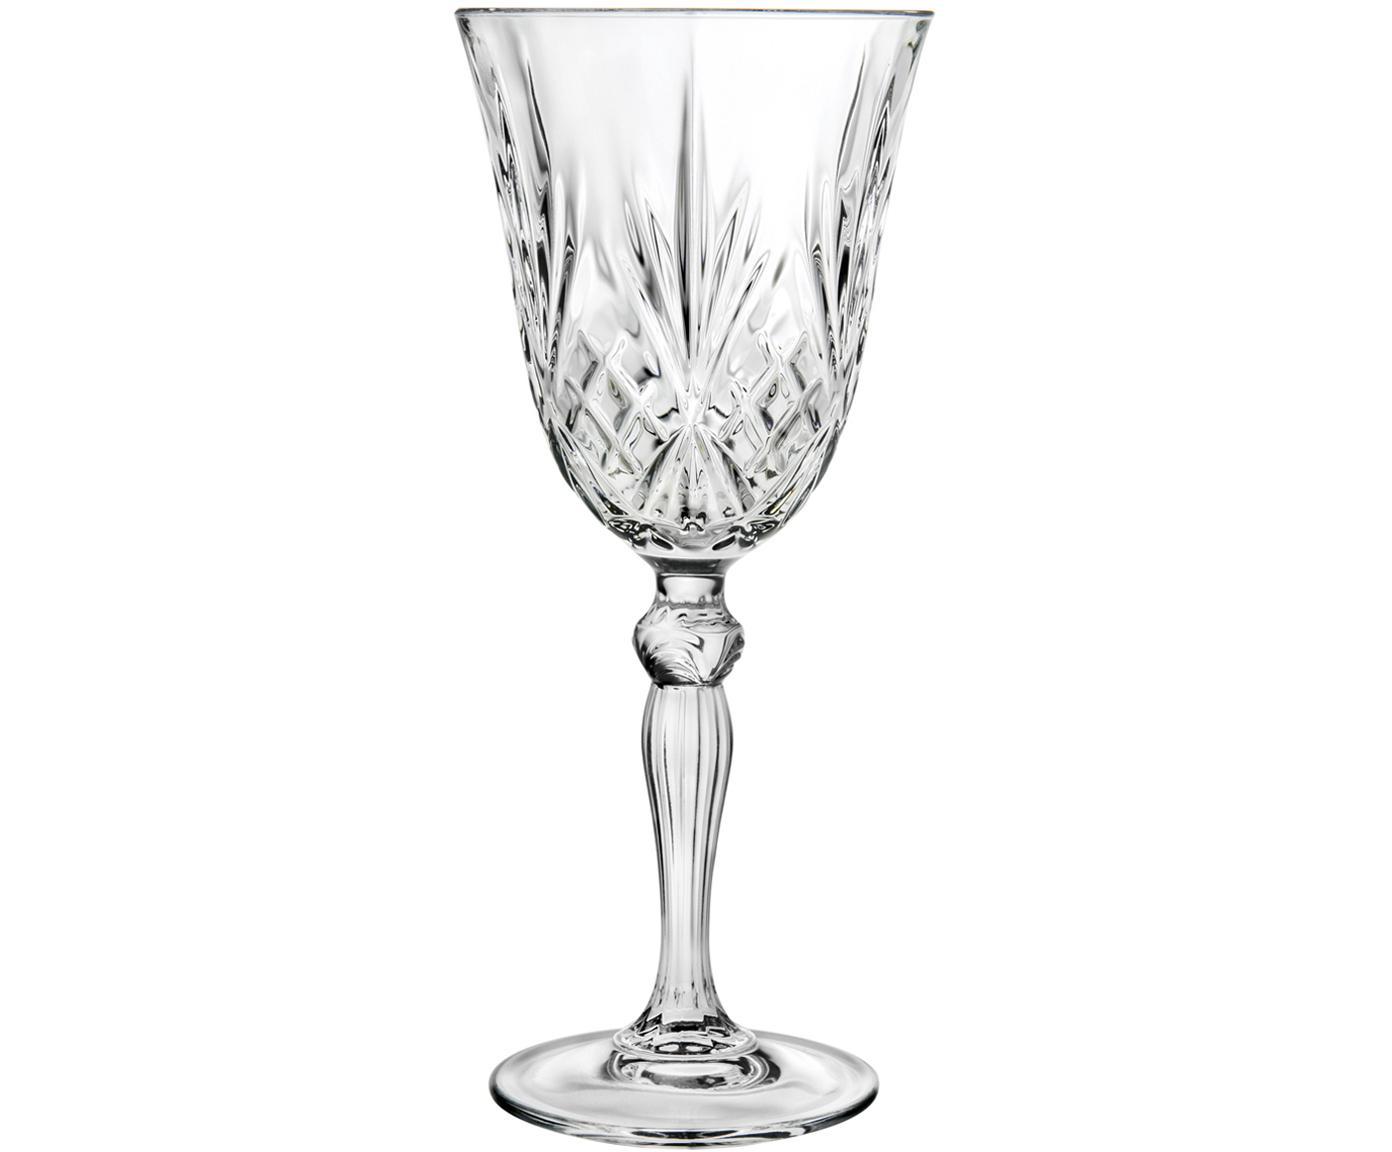 Kristallen witte wijnglazen Melodia, 6 stuks, Kristalglas, Transparant, Ø 8 x H 19 cm